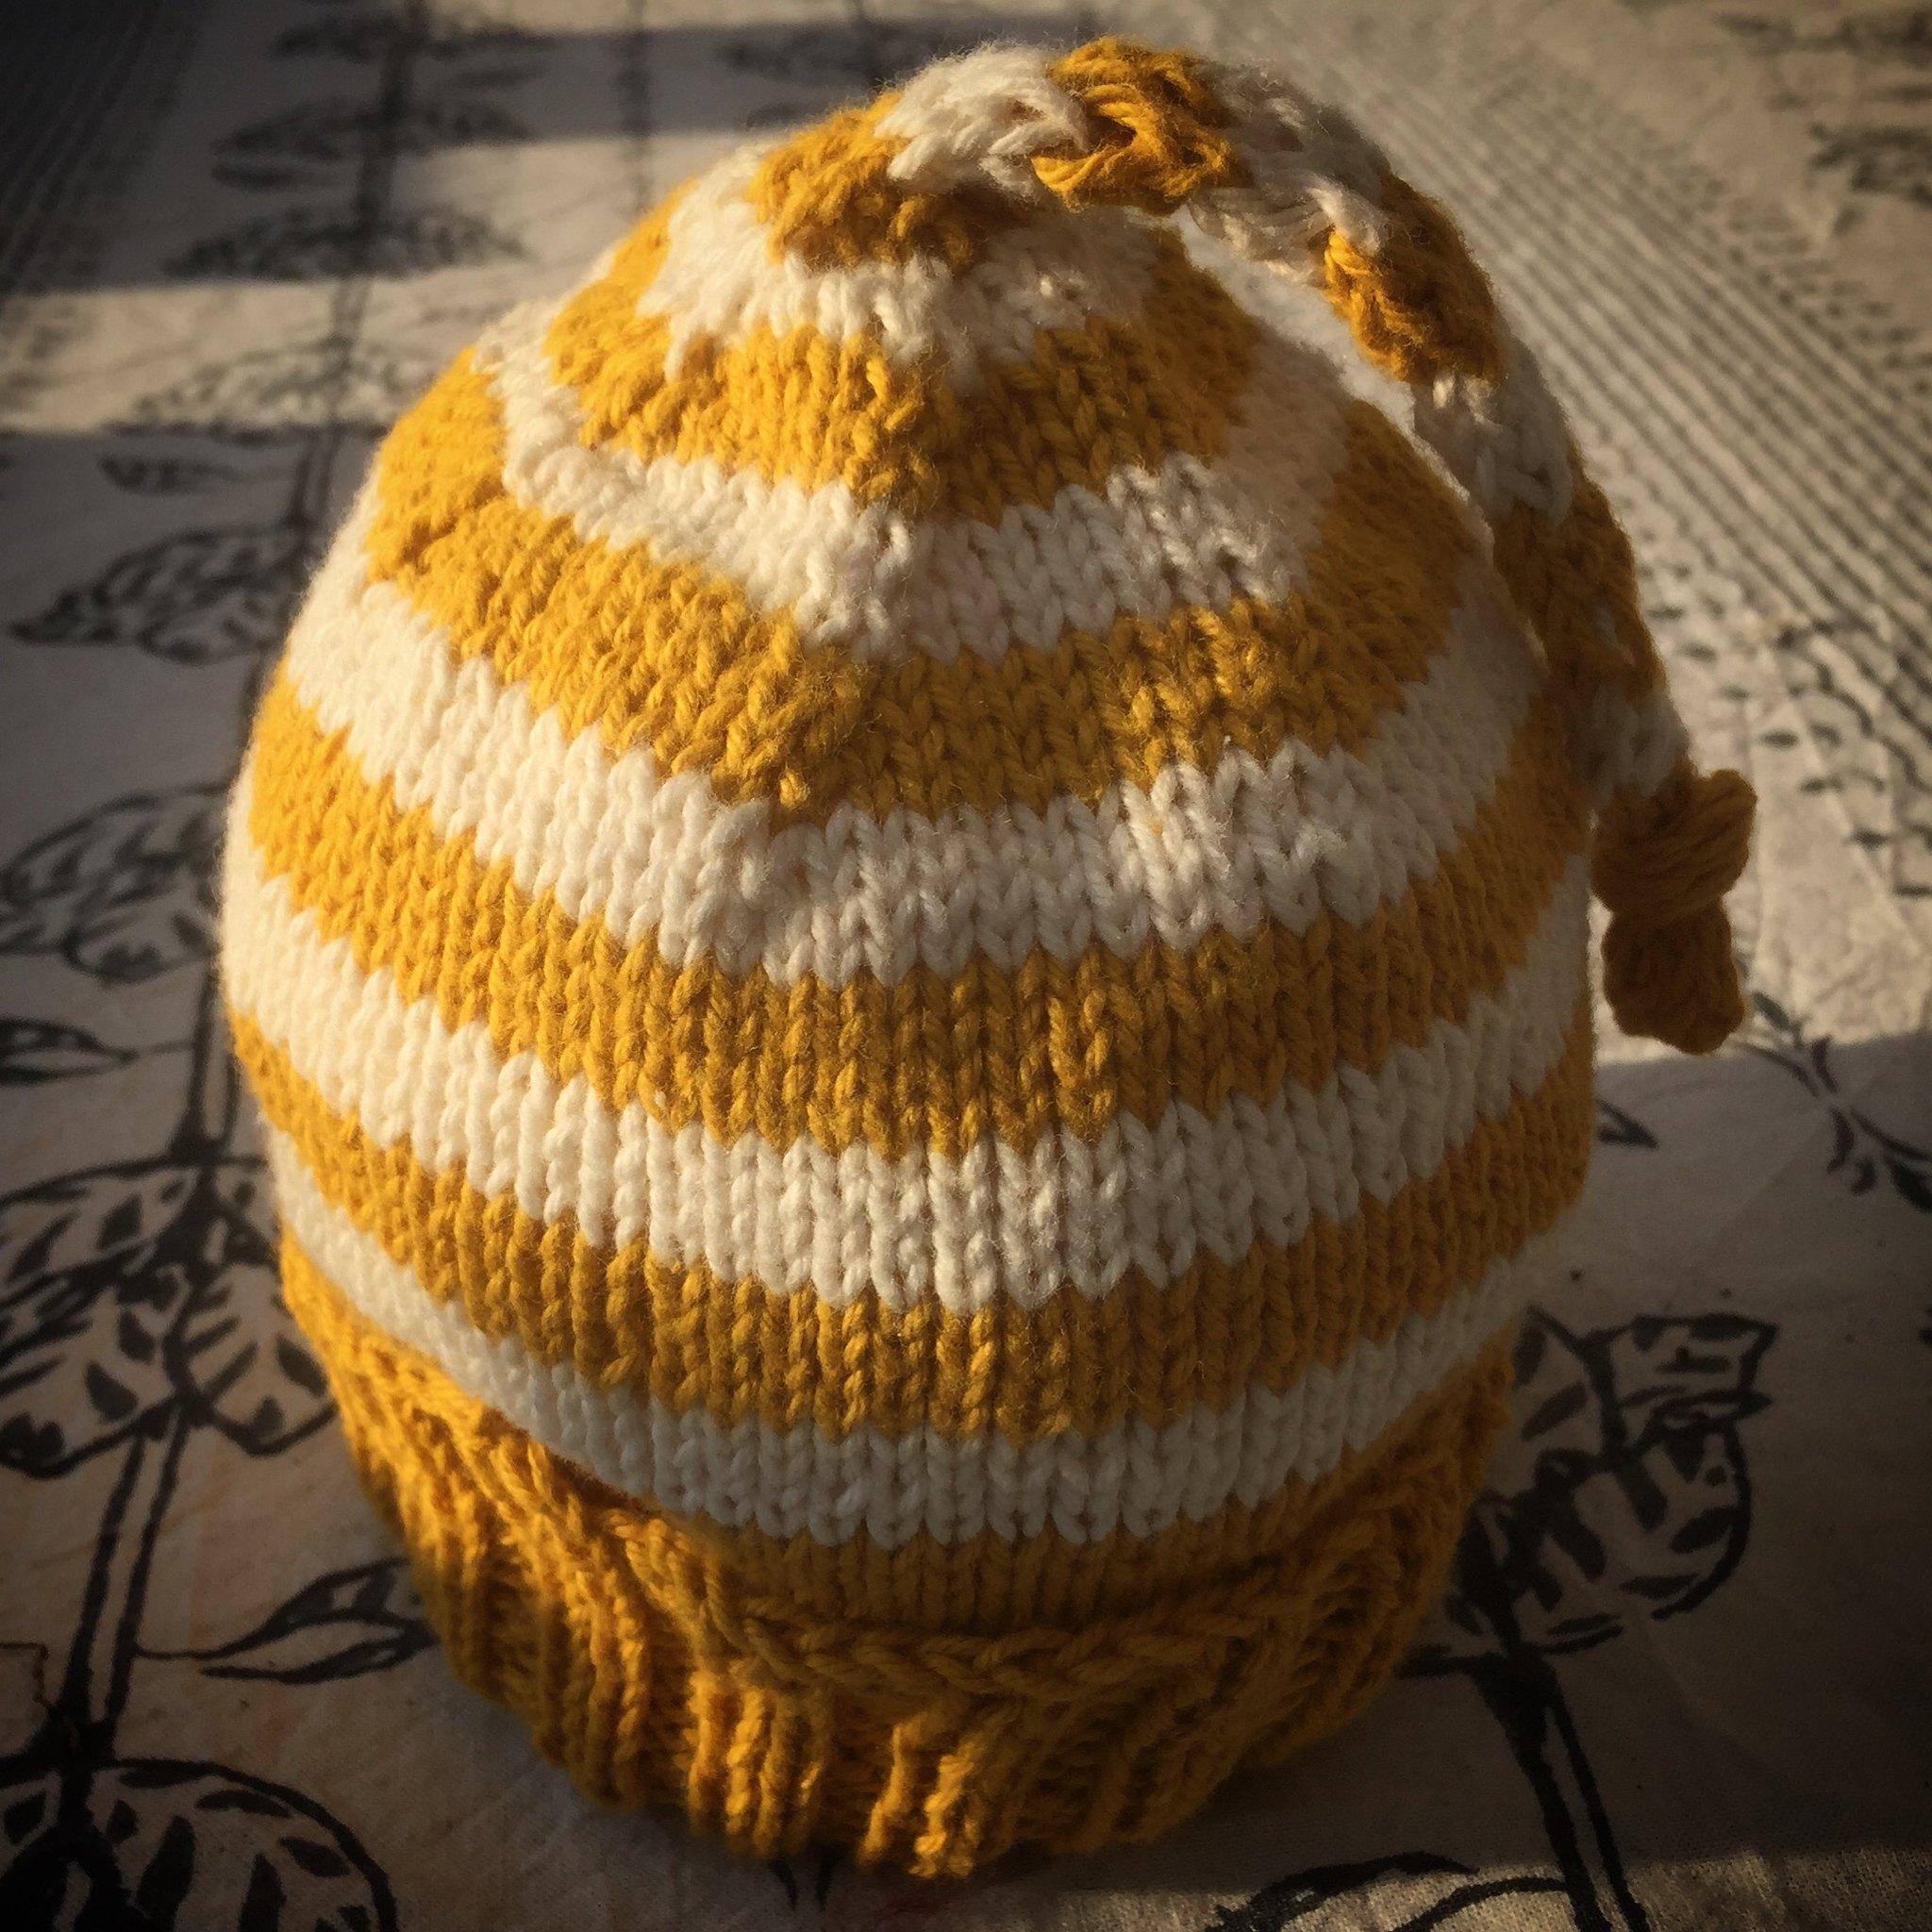 Diddeli-dum, baby hat